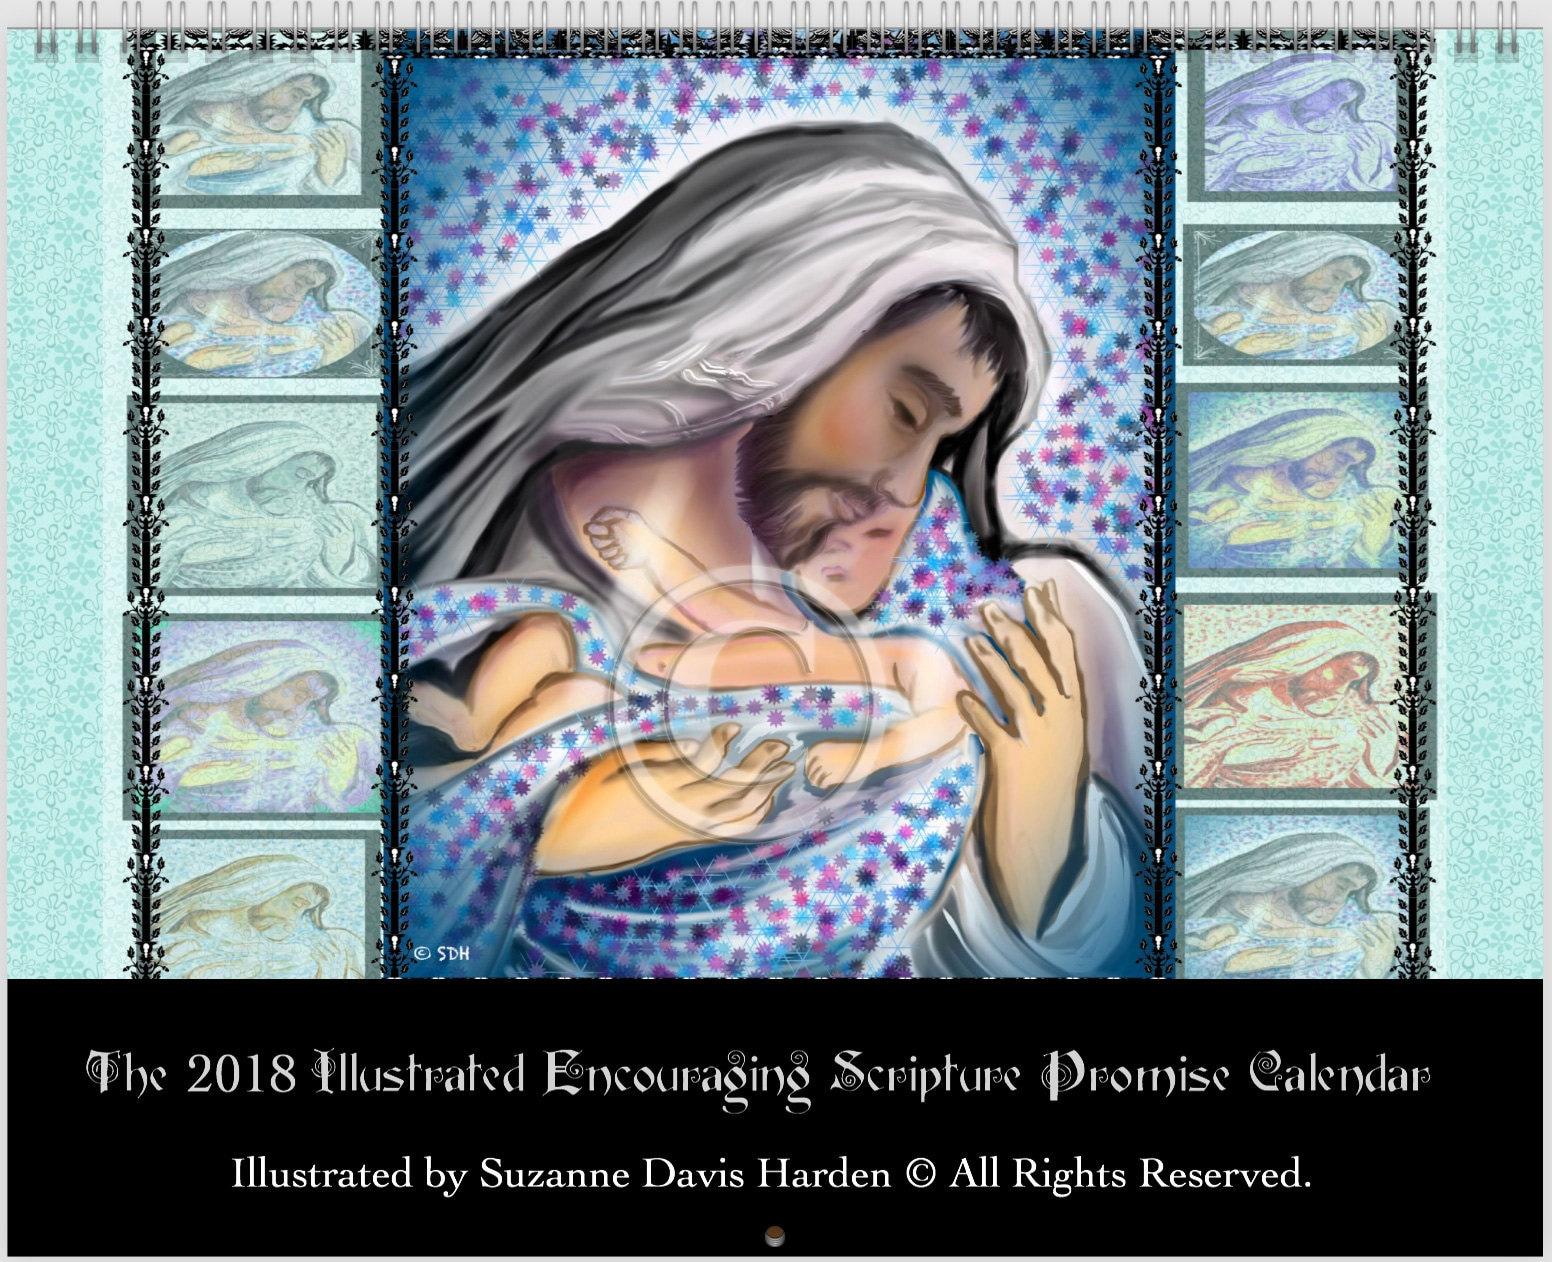 The 2018 Illustrated Encouraging Promise Calendar